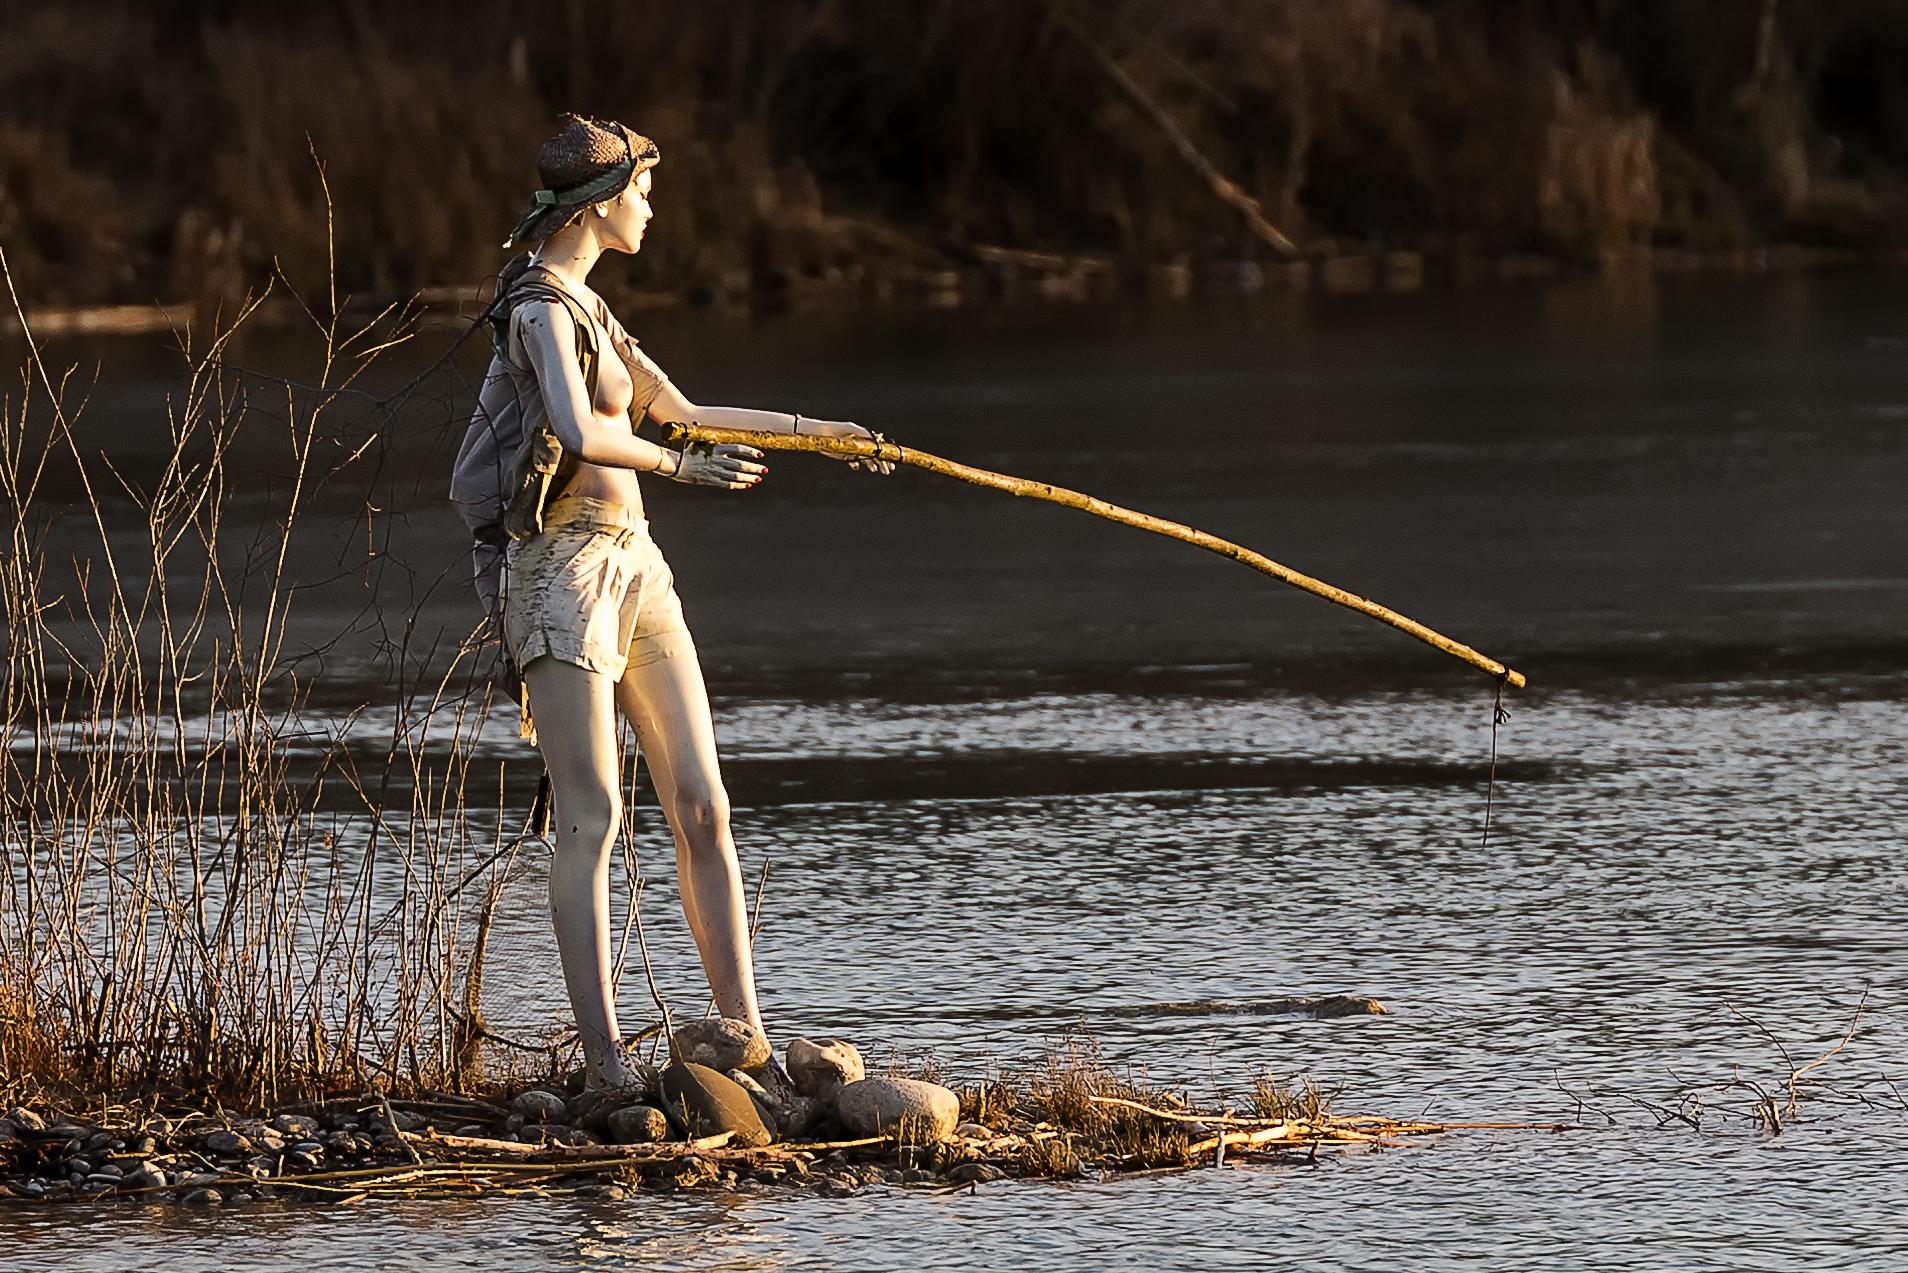 Wallpaper Sea Lake Water Reflection Angel Mask Fish Lost River Statue Alone Topless Boobs Stream Paddle Fisherman Man Rio Nice Lago